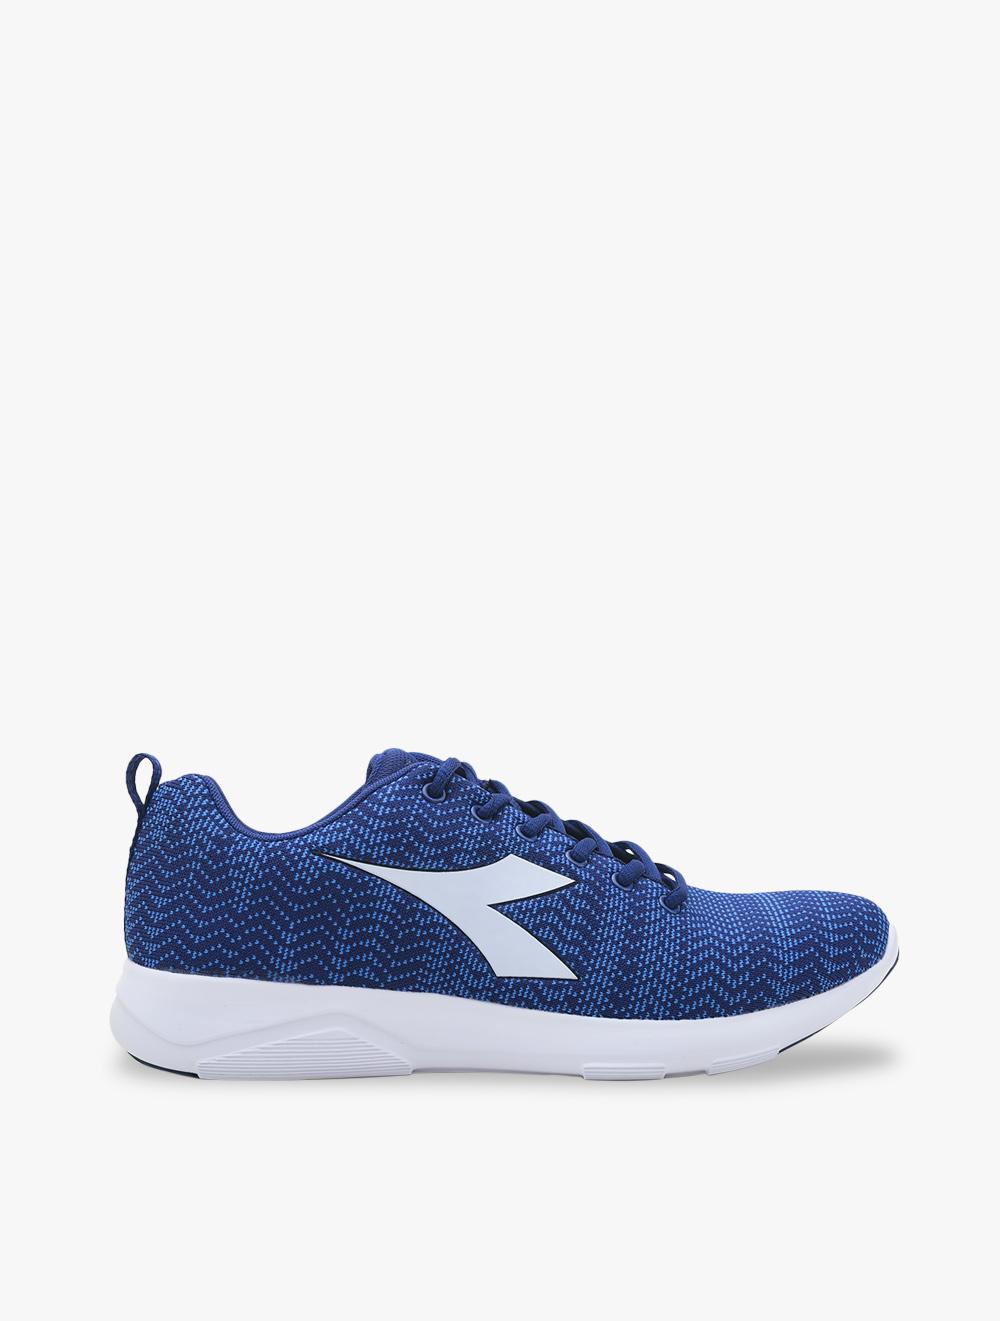 Diadora X RUN LIGHT  Casual Running  Shoes Blue Mens